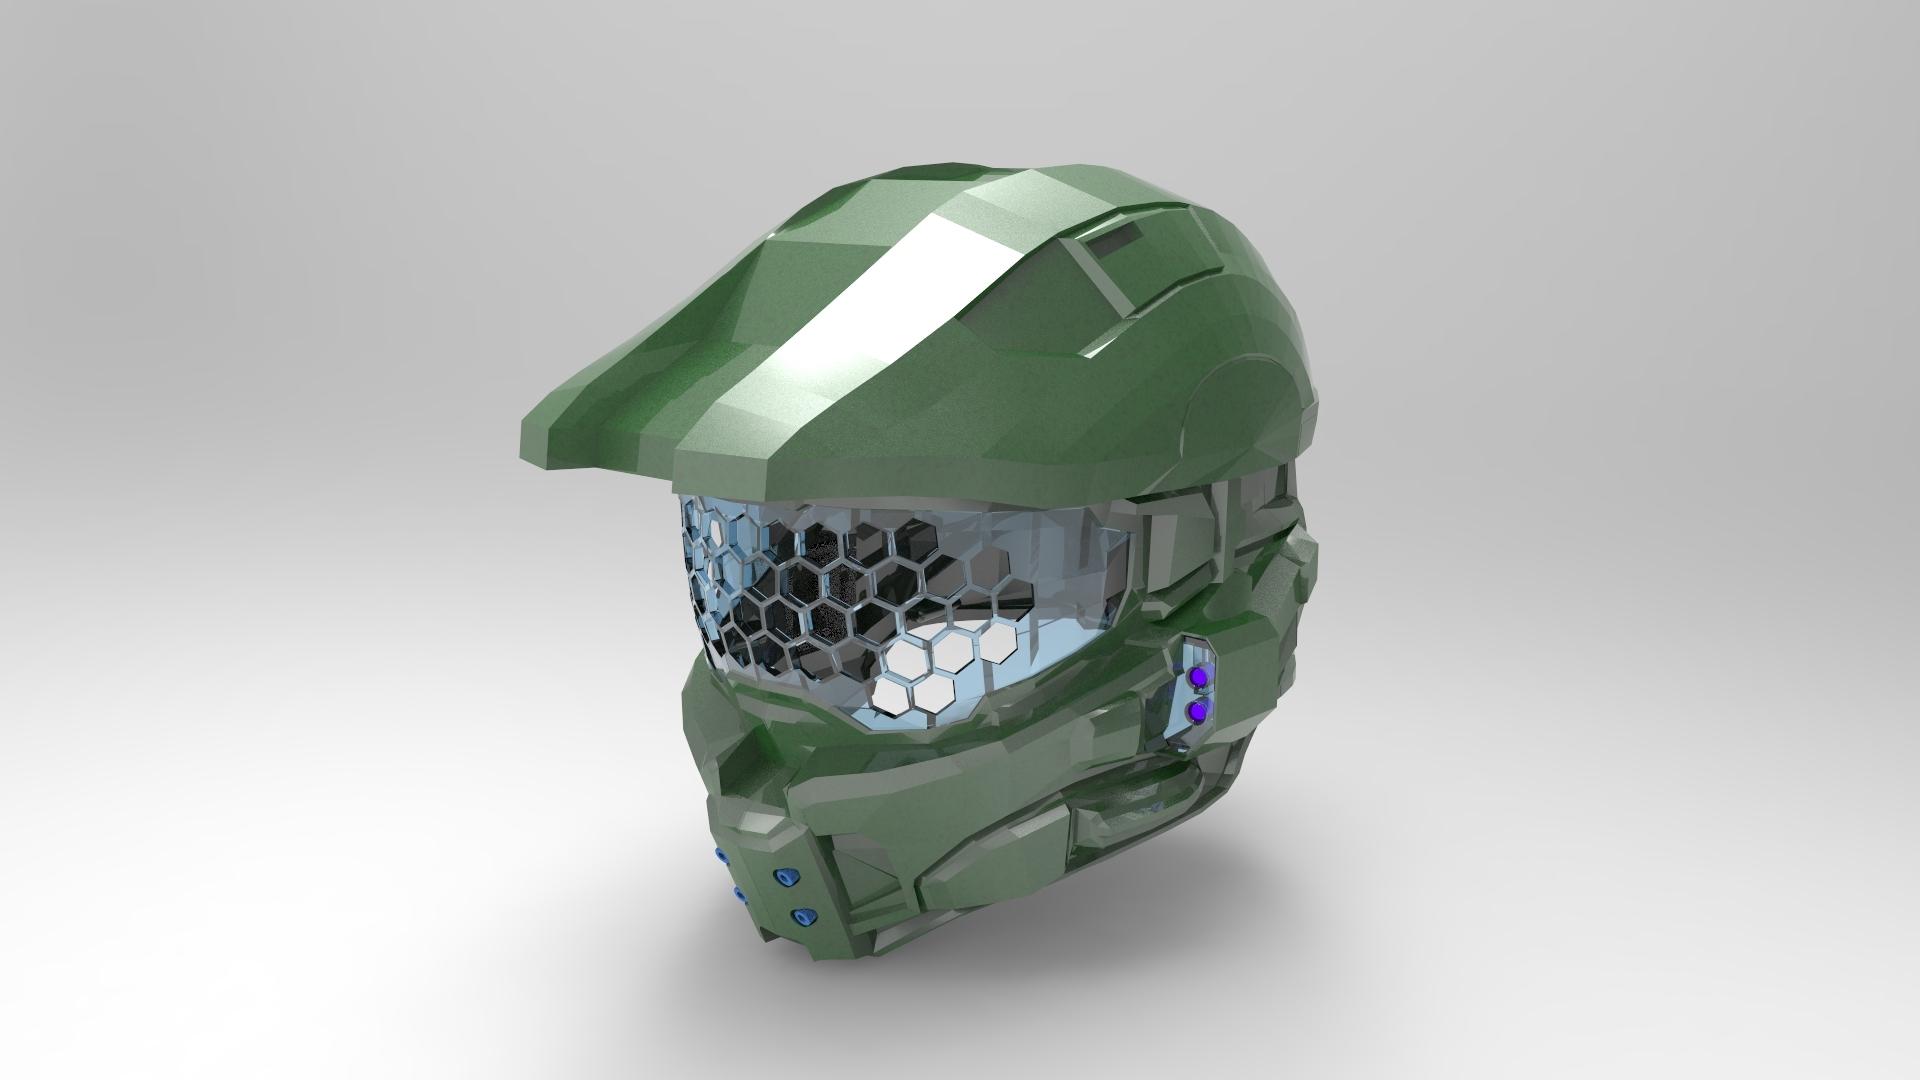 3d Curved Wallpaper Halo 4 Helmet Keyshot Render Autodesk Online Gallery